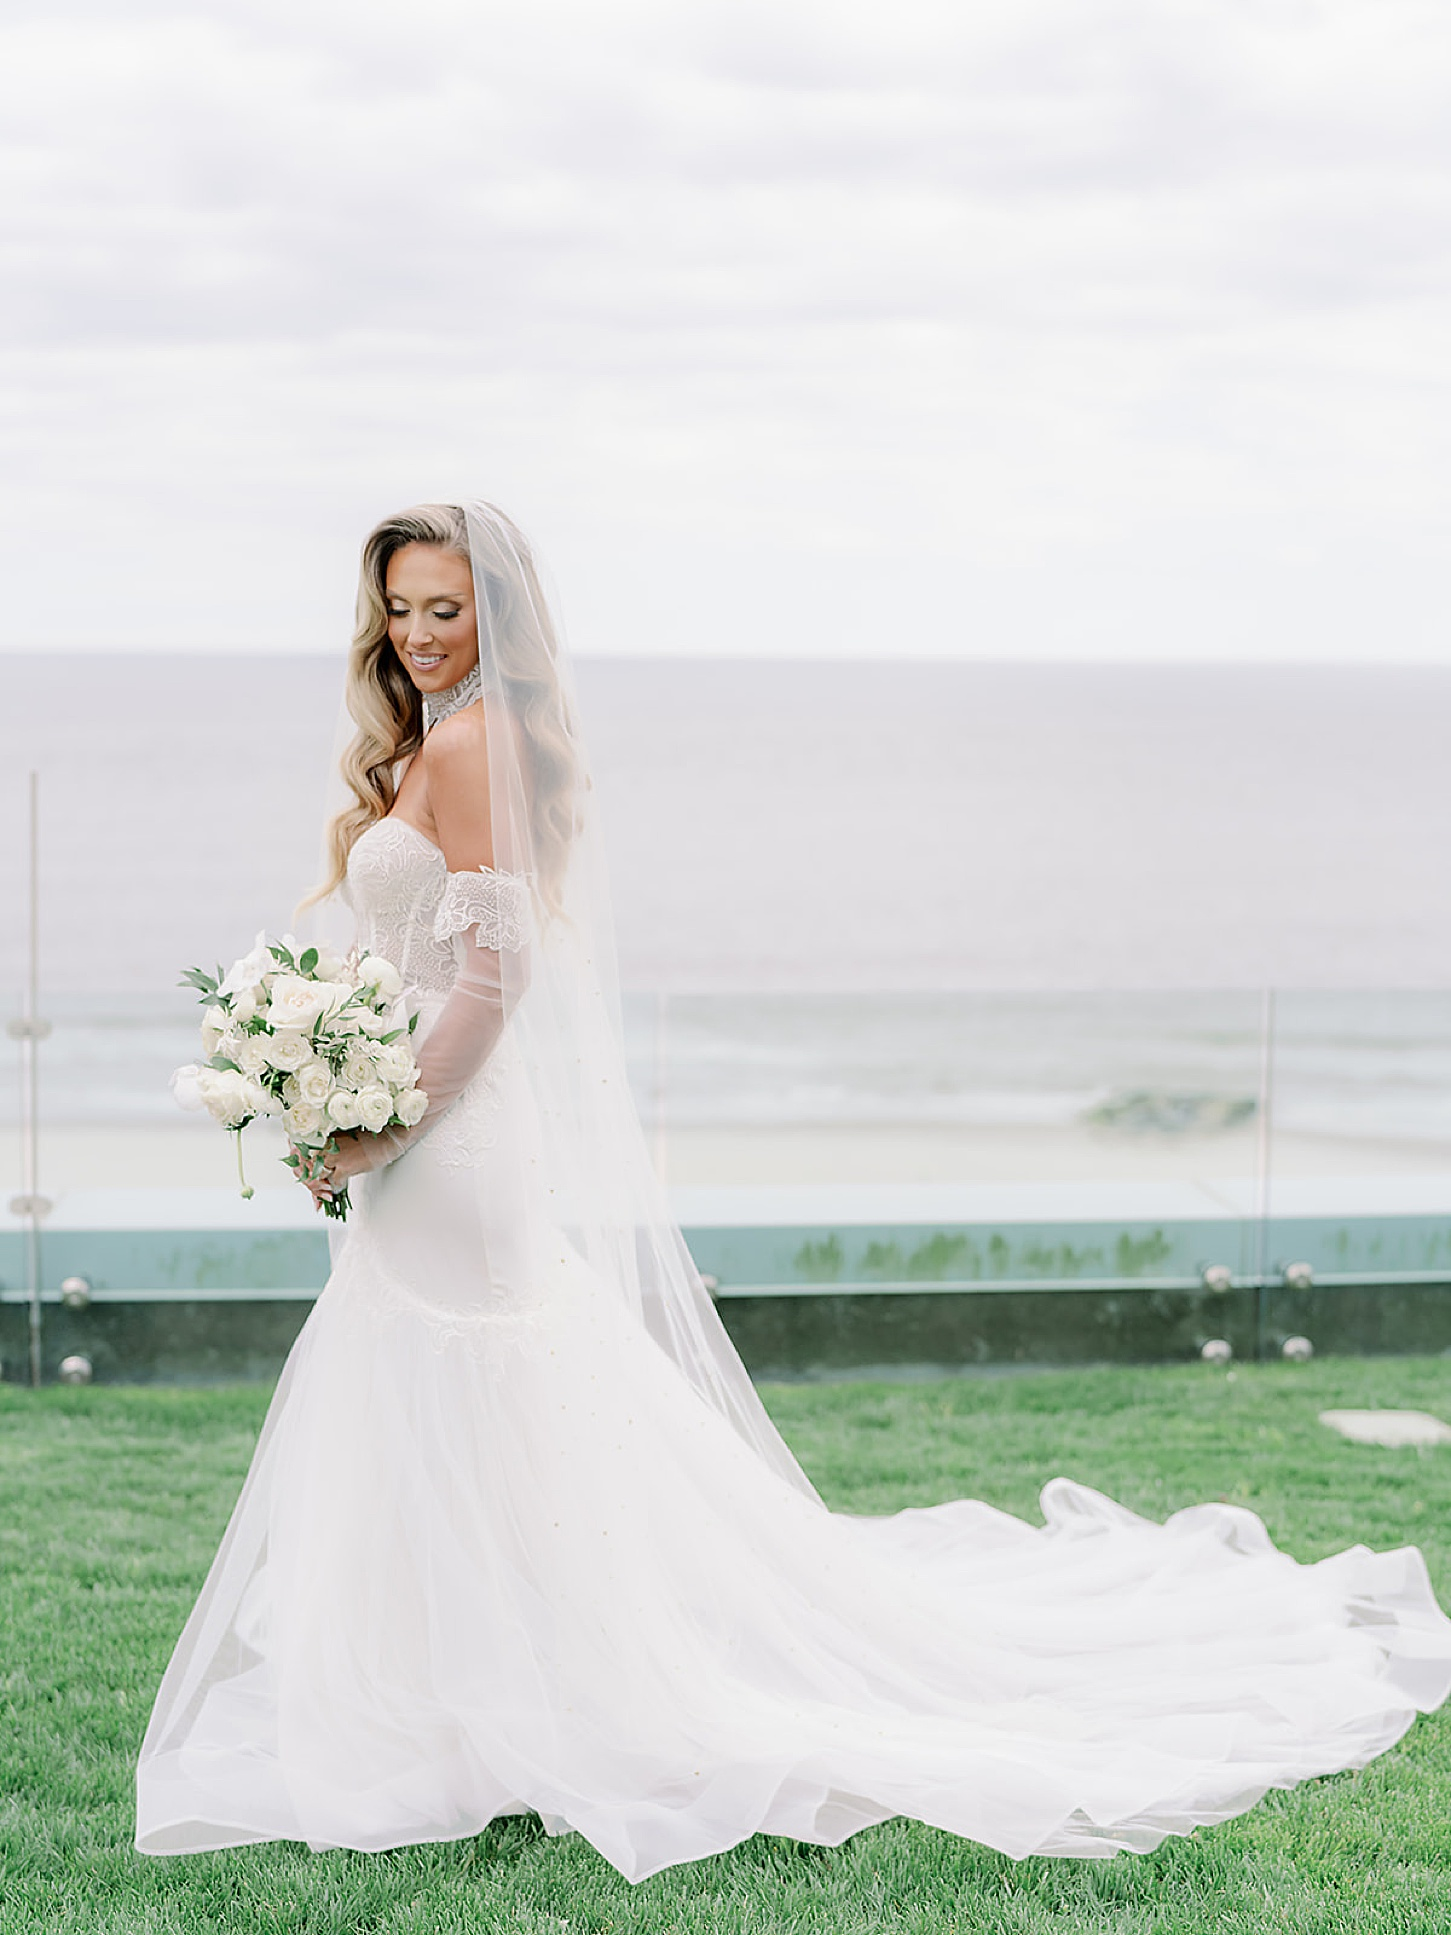 Atlantic City Wedding Photography Studio by Magdalena Studios Lexy Cha 0063